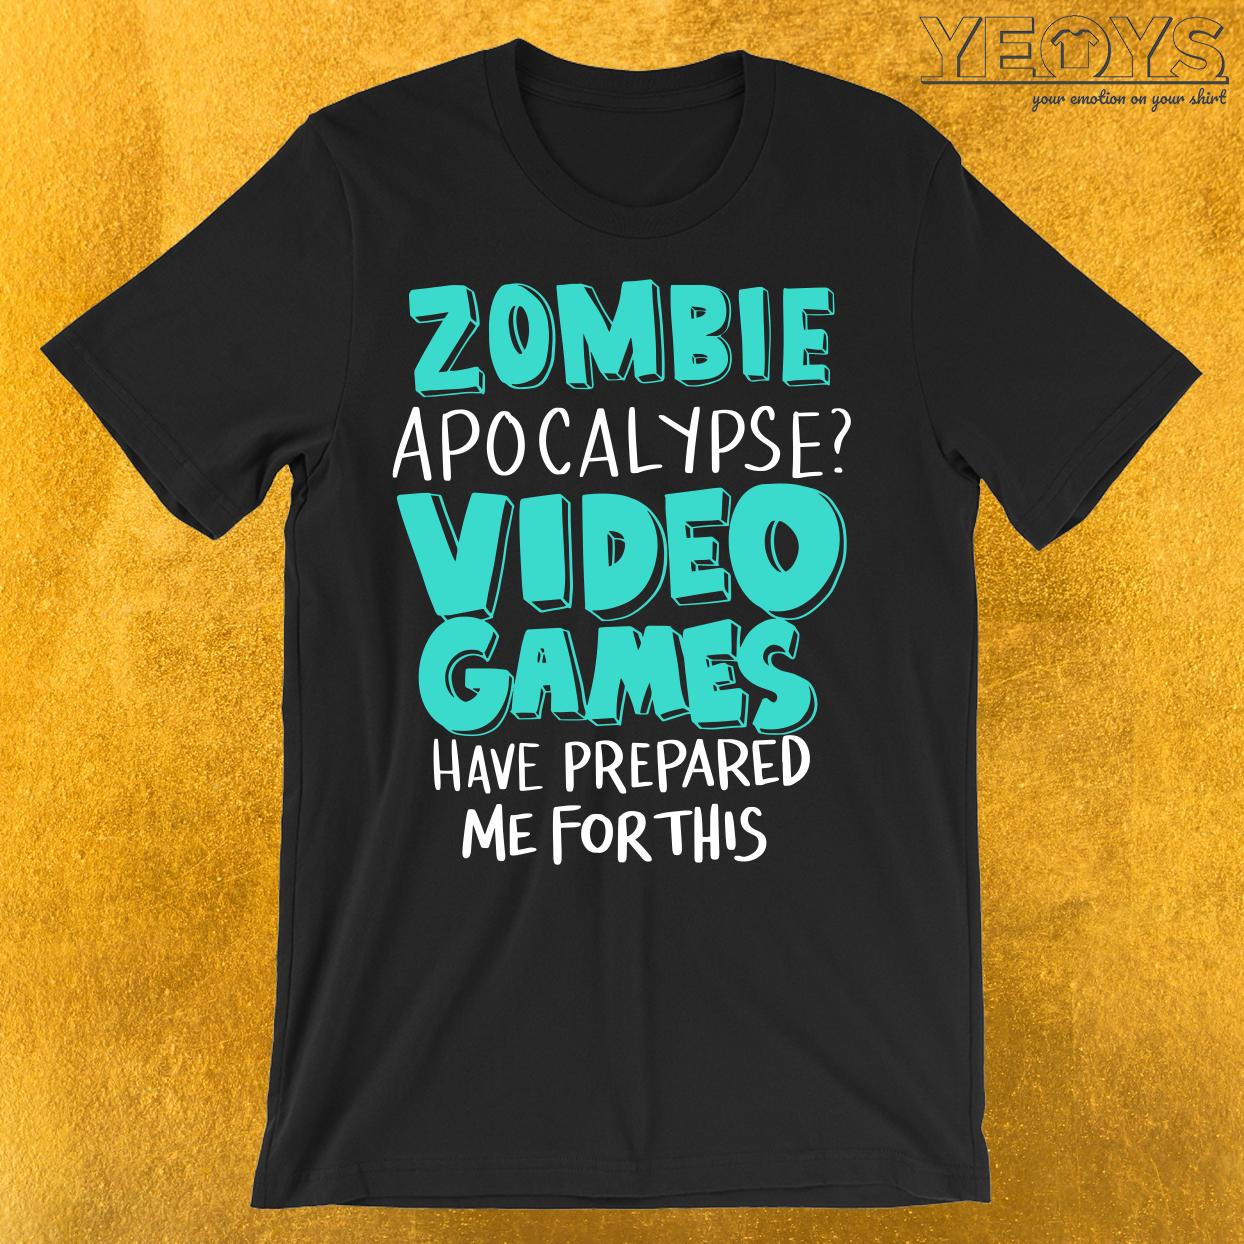 Zombie Apocalypse Video Games Prepared Me Funny Gaming Quote Funny Gaming Quote Gift With Original Funny Gaming Quotes Gamer T Shirt Funny Gaming Memes